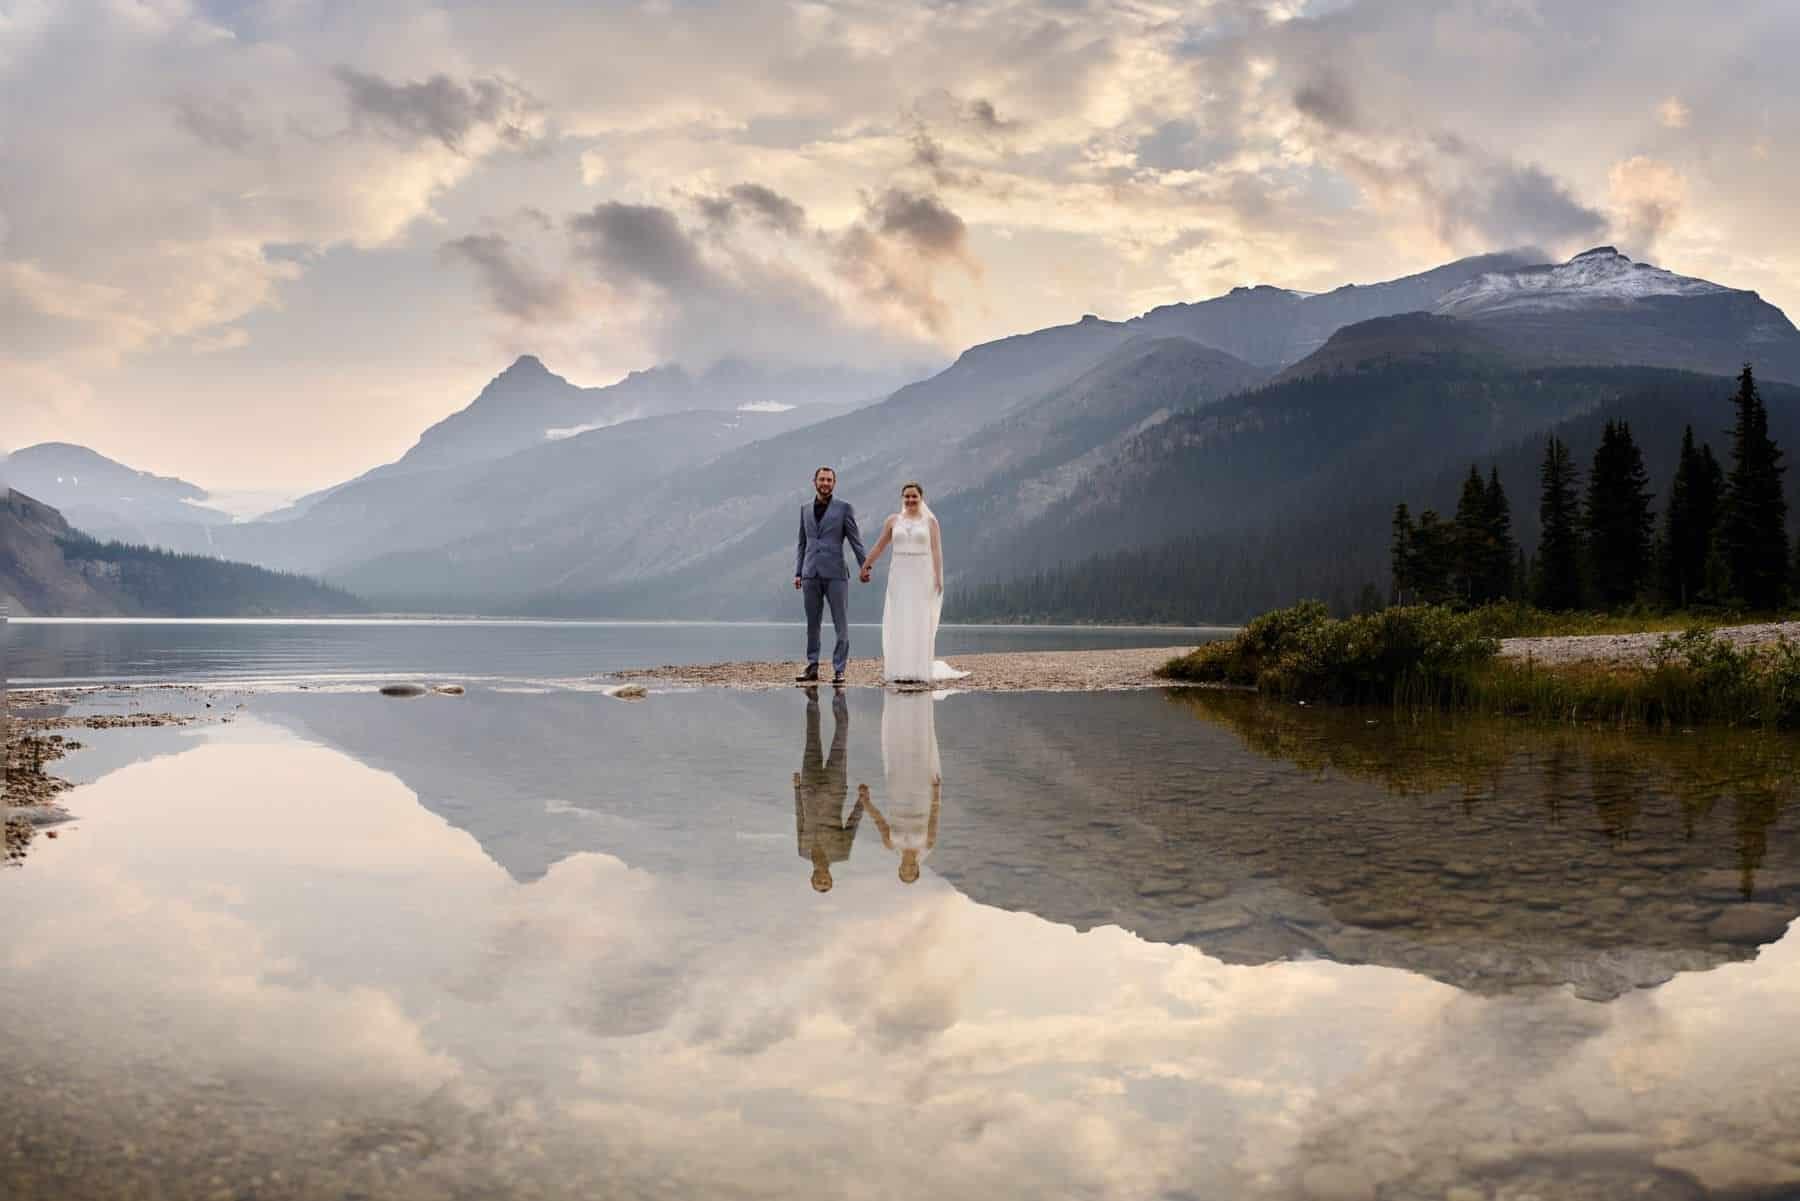 Worn Leather Media Wedding & Engagement Photography Cover Image